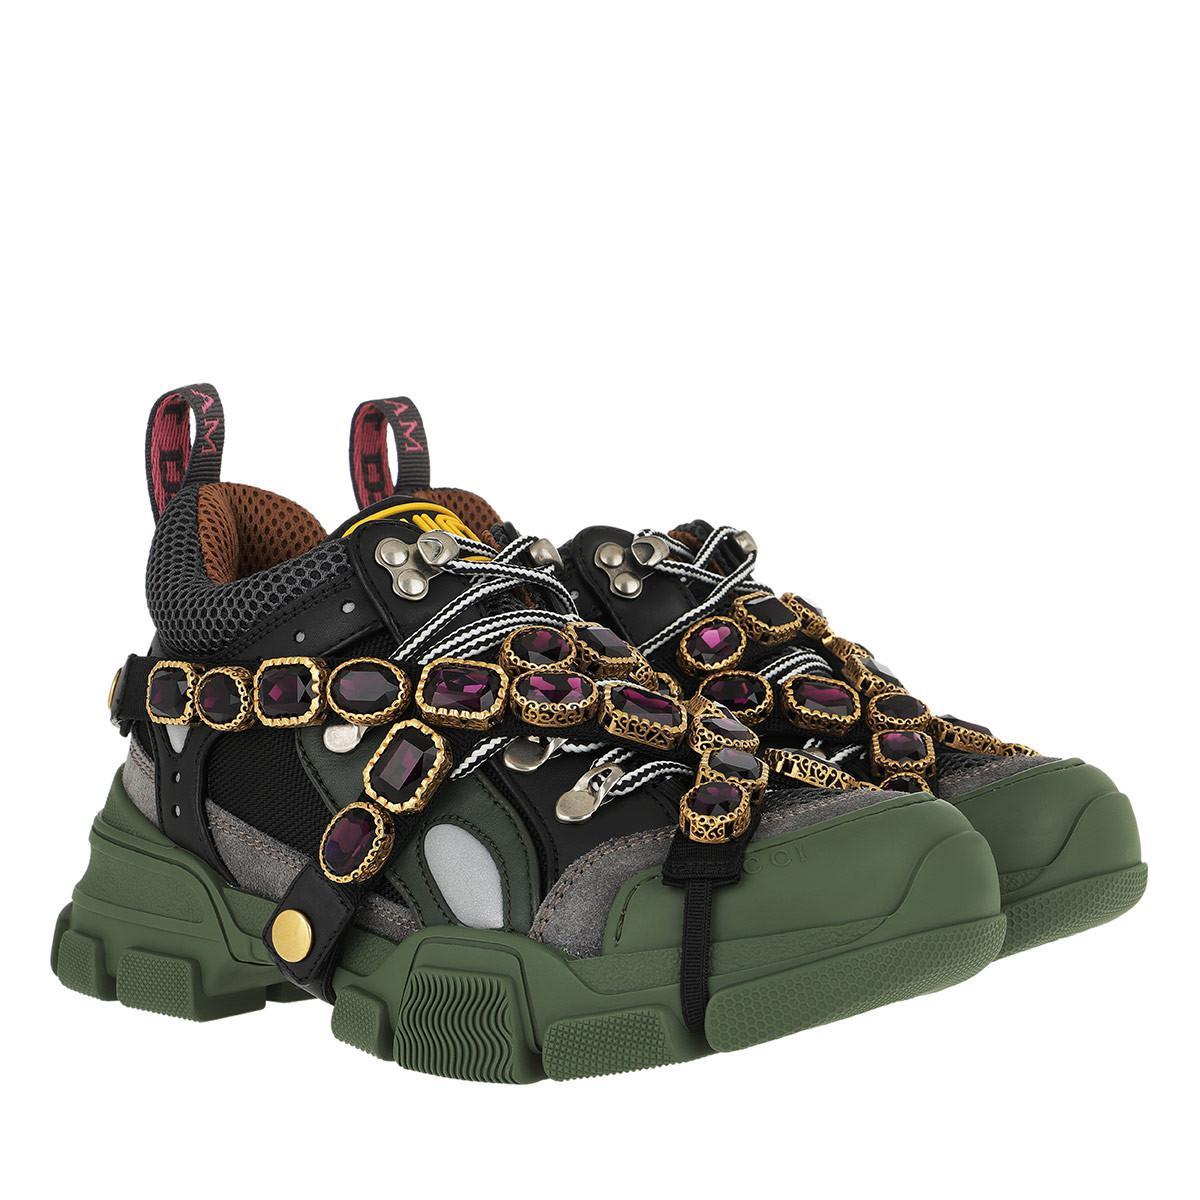 8e8a80897c2e Gucci Flashtrek Jewel Sneaker - Save 27% - Lyst